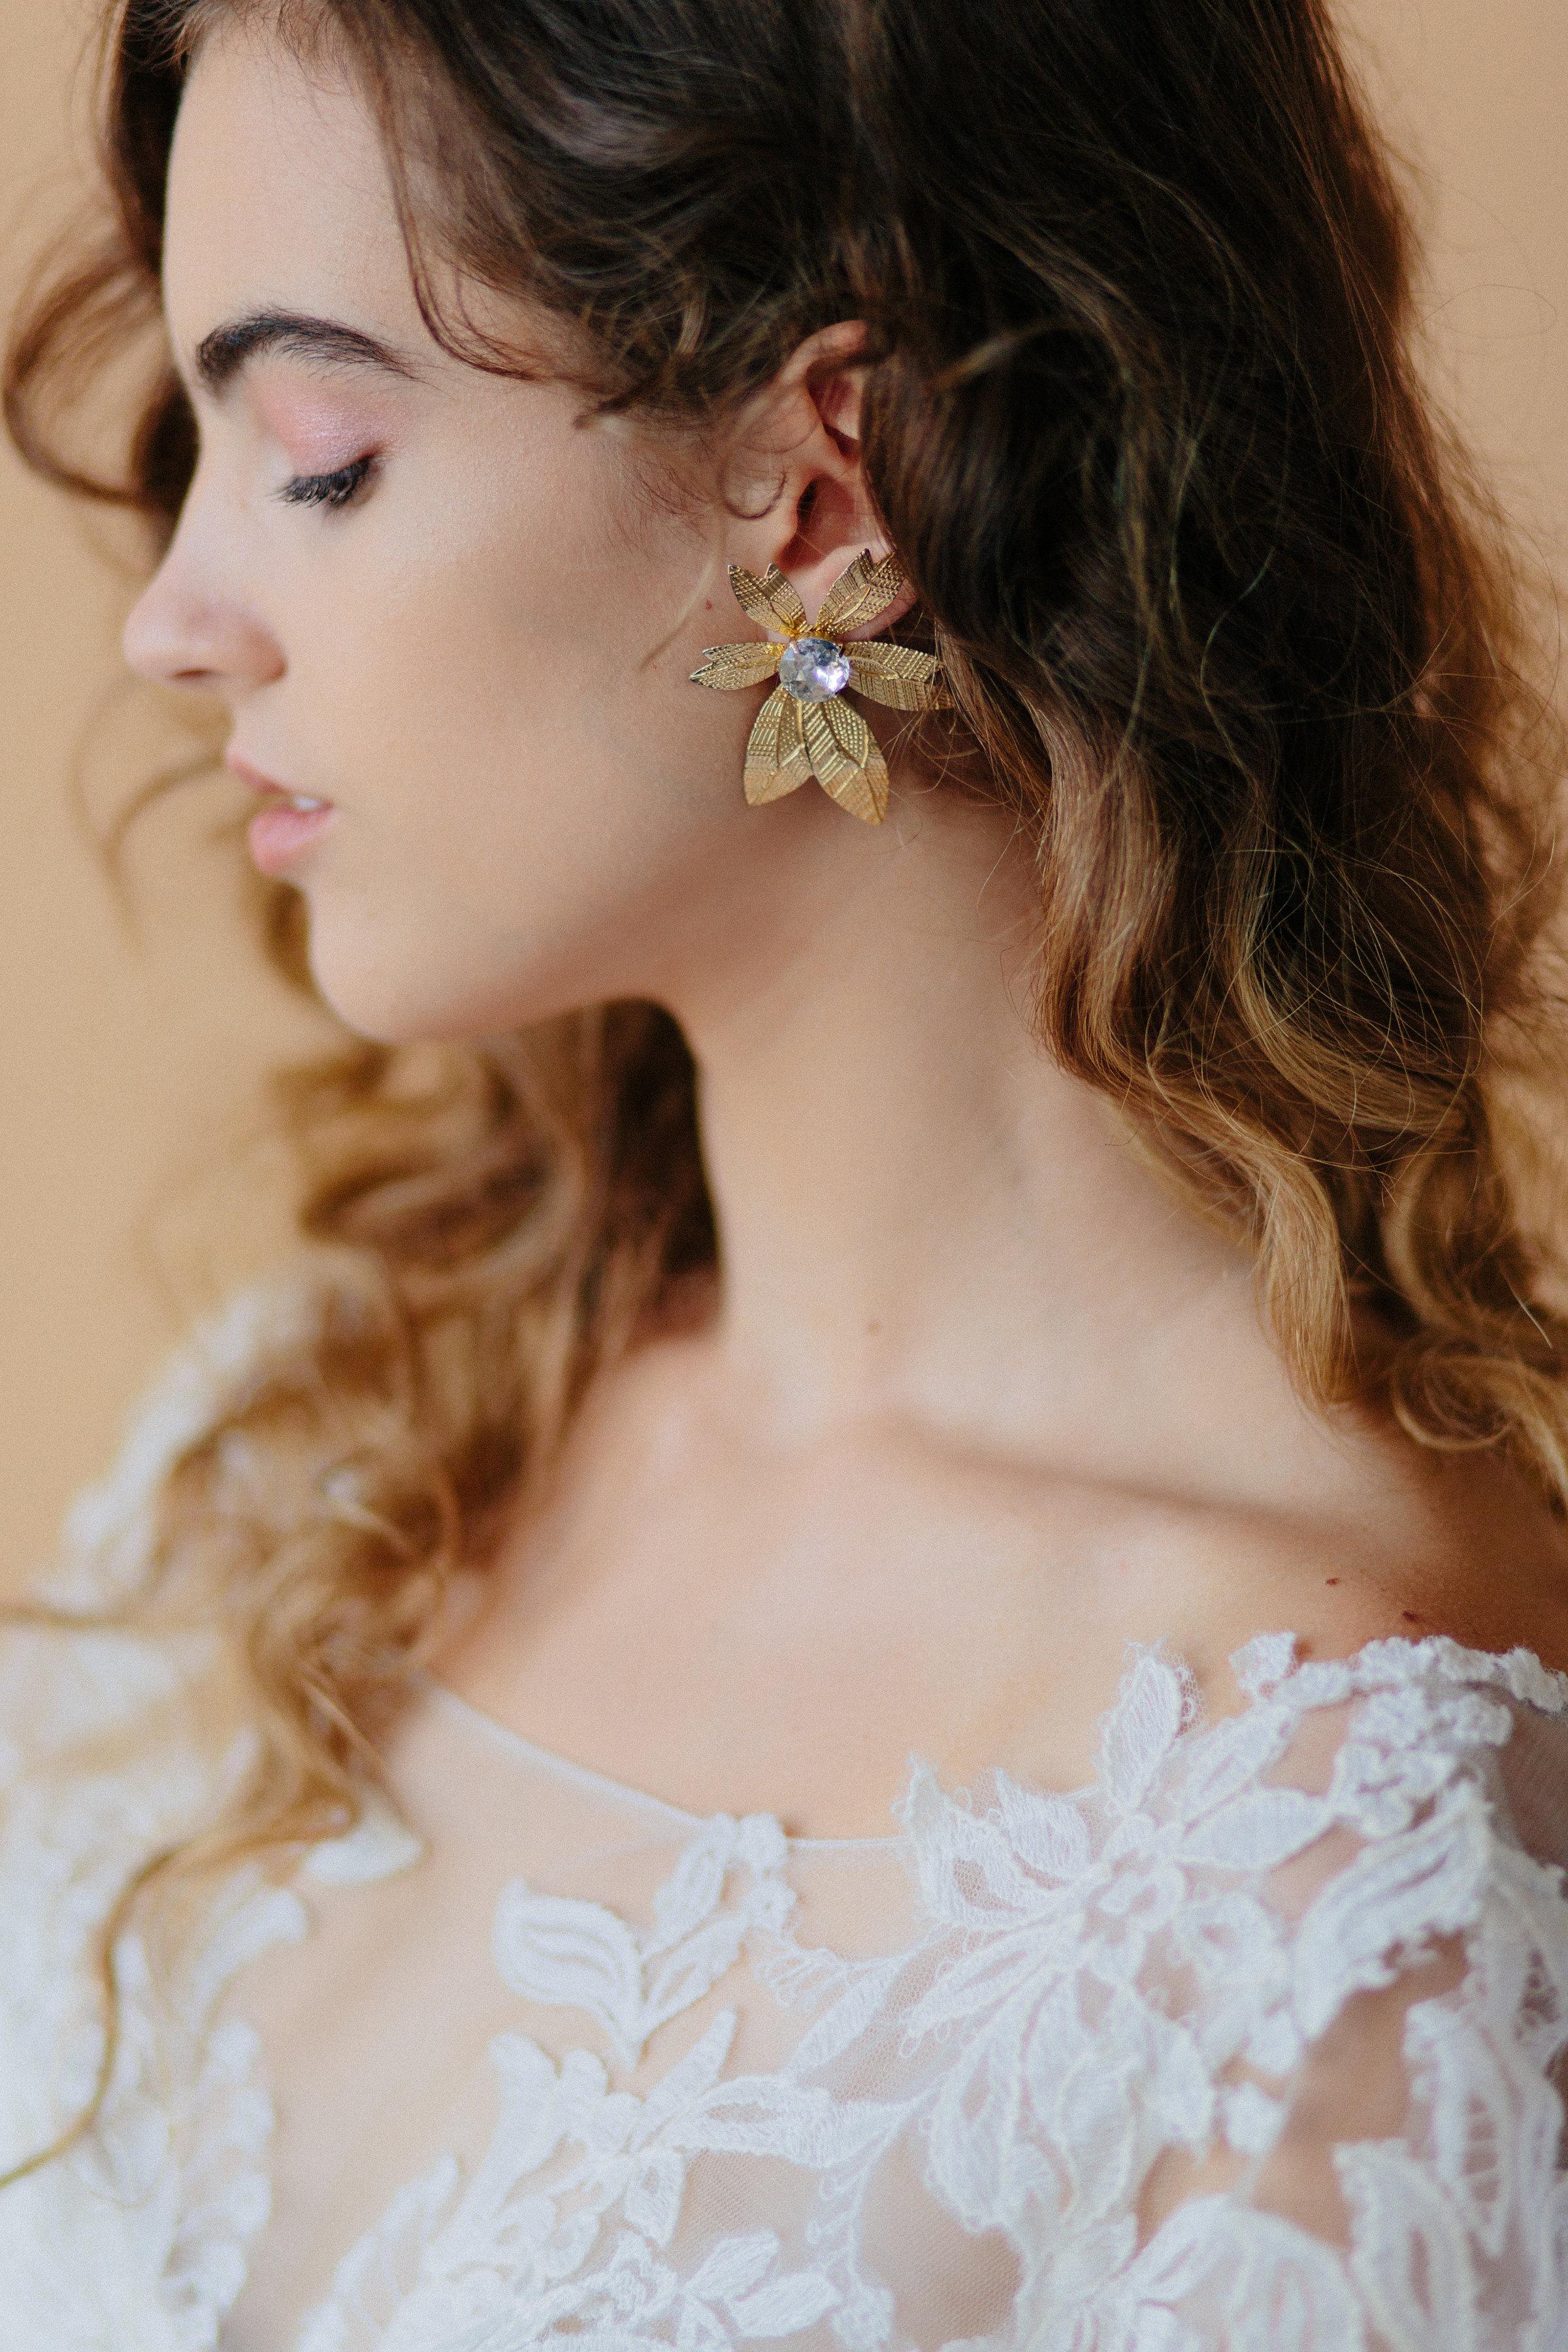 Model: Amy | Dress:  Bel Fiore Bridal  | Earring: Vintage | Hair & Makeup:  Corianne Elizabeth Beauty  | Photography:  Michelle Scott Photography